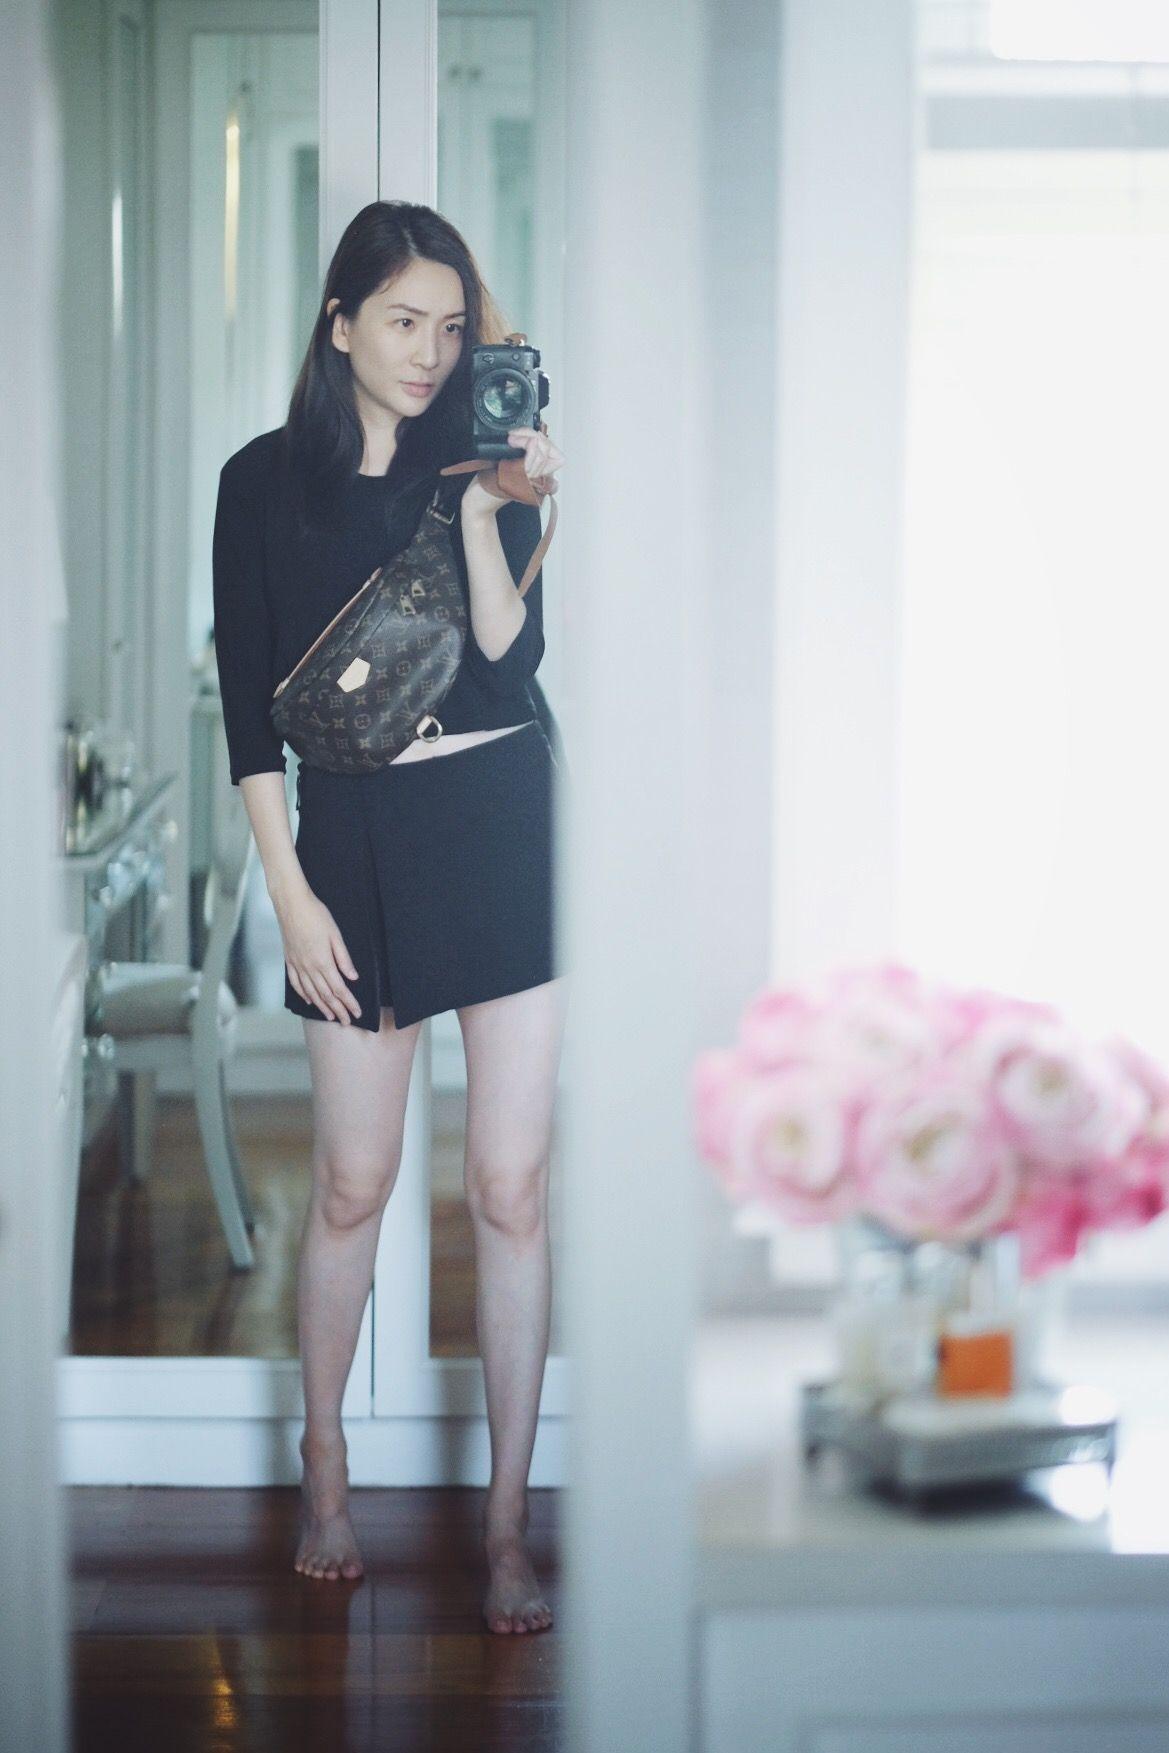 12668ec49b11 Louis Vuitton bum bag 2018 | Fashion | Bags 2018, Fashion, Bum bag